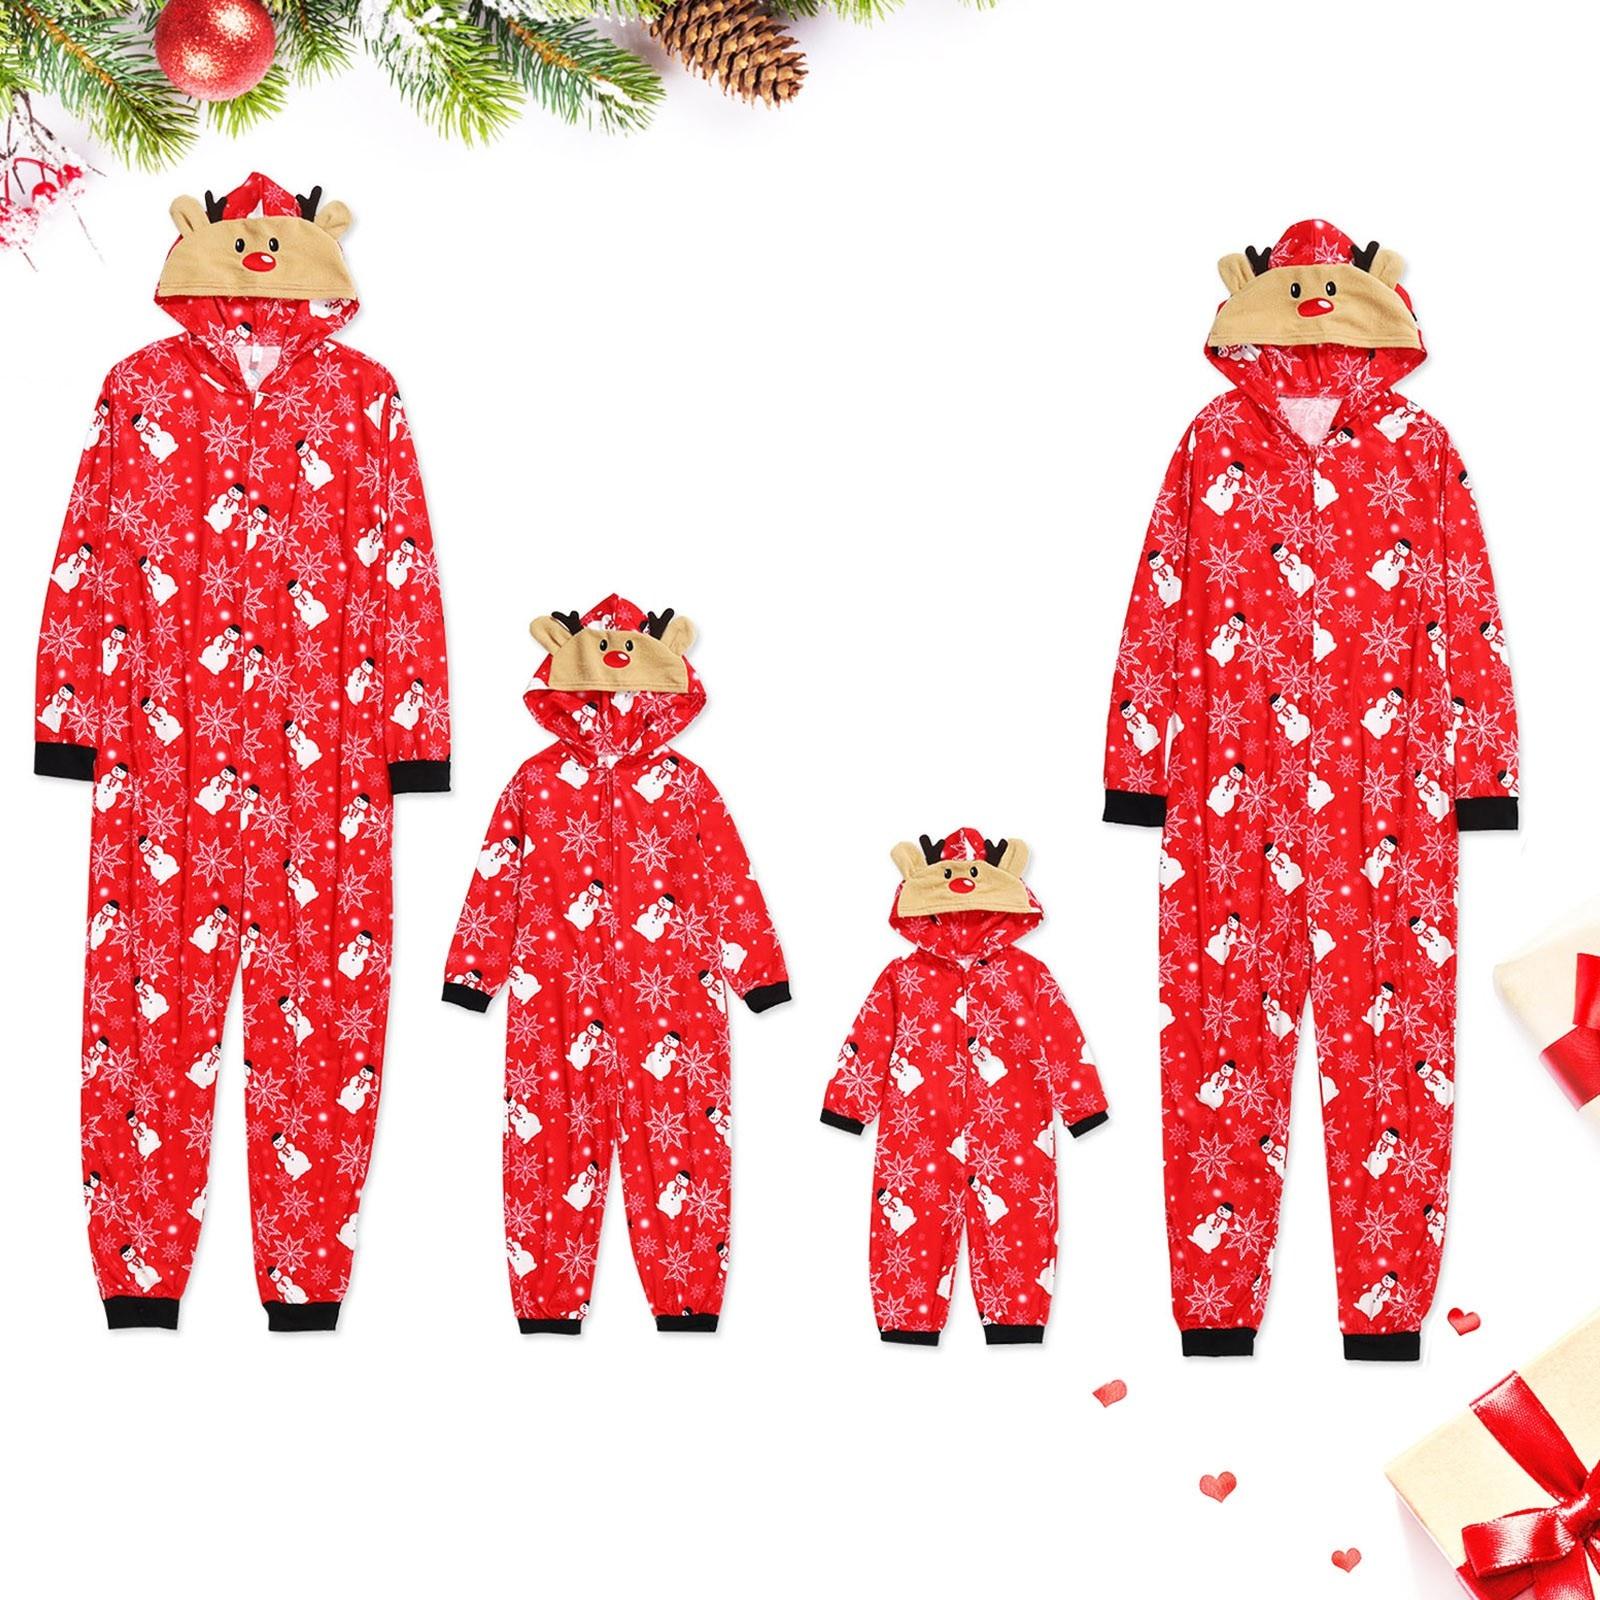 Pelele navideño para bebé, ropa a juego para Familia, pijamas, ropa de...